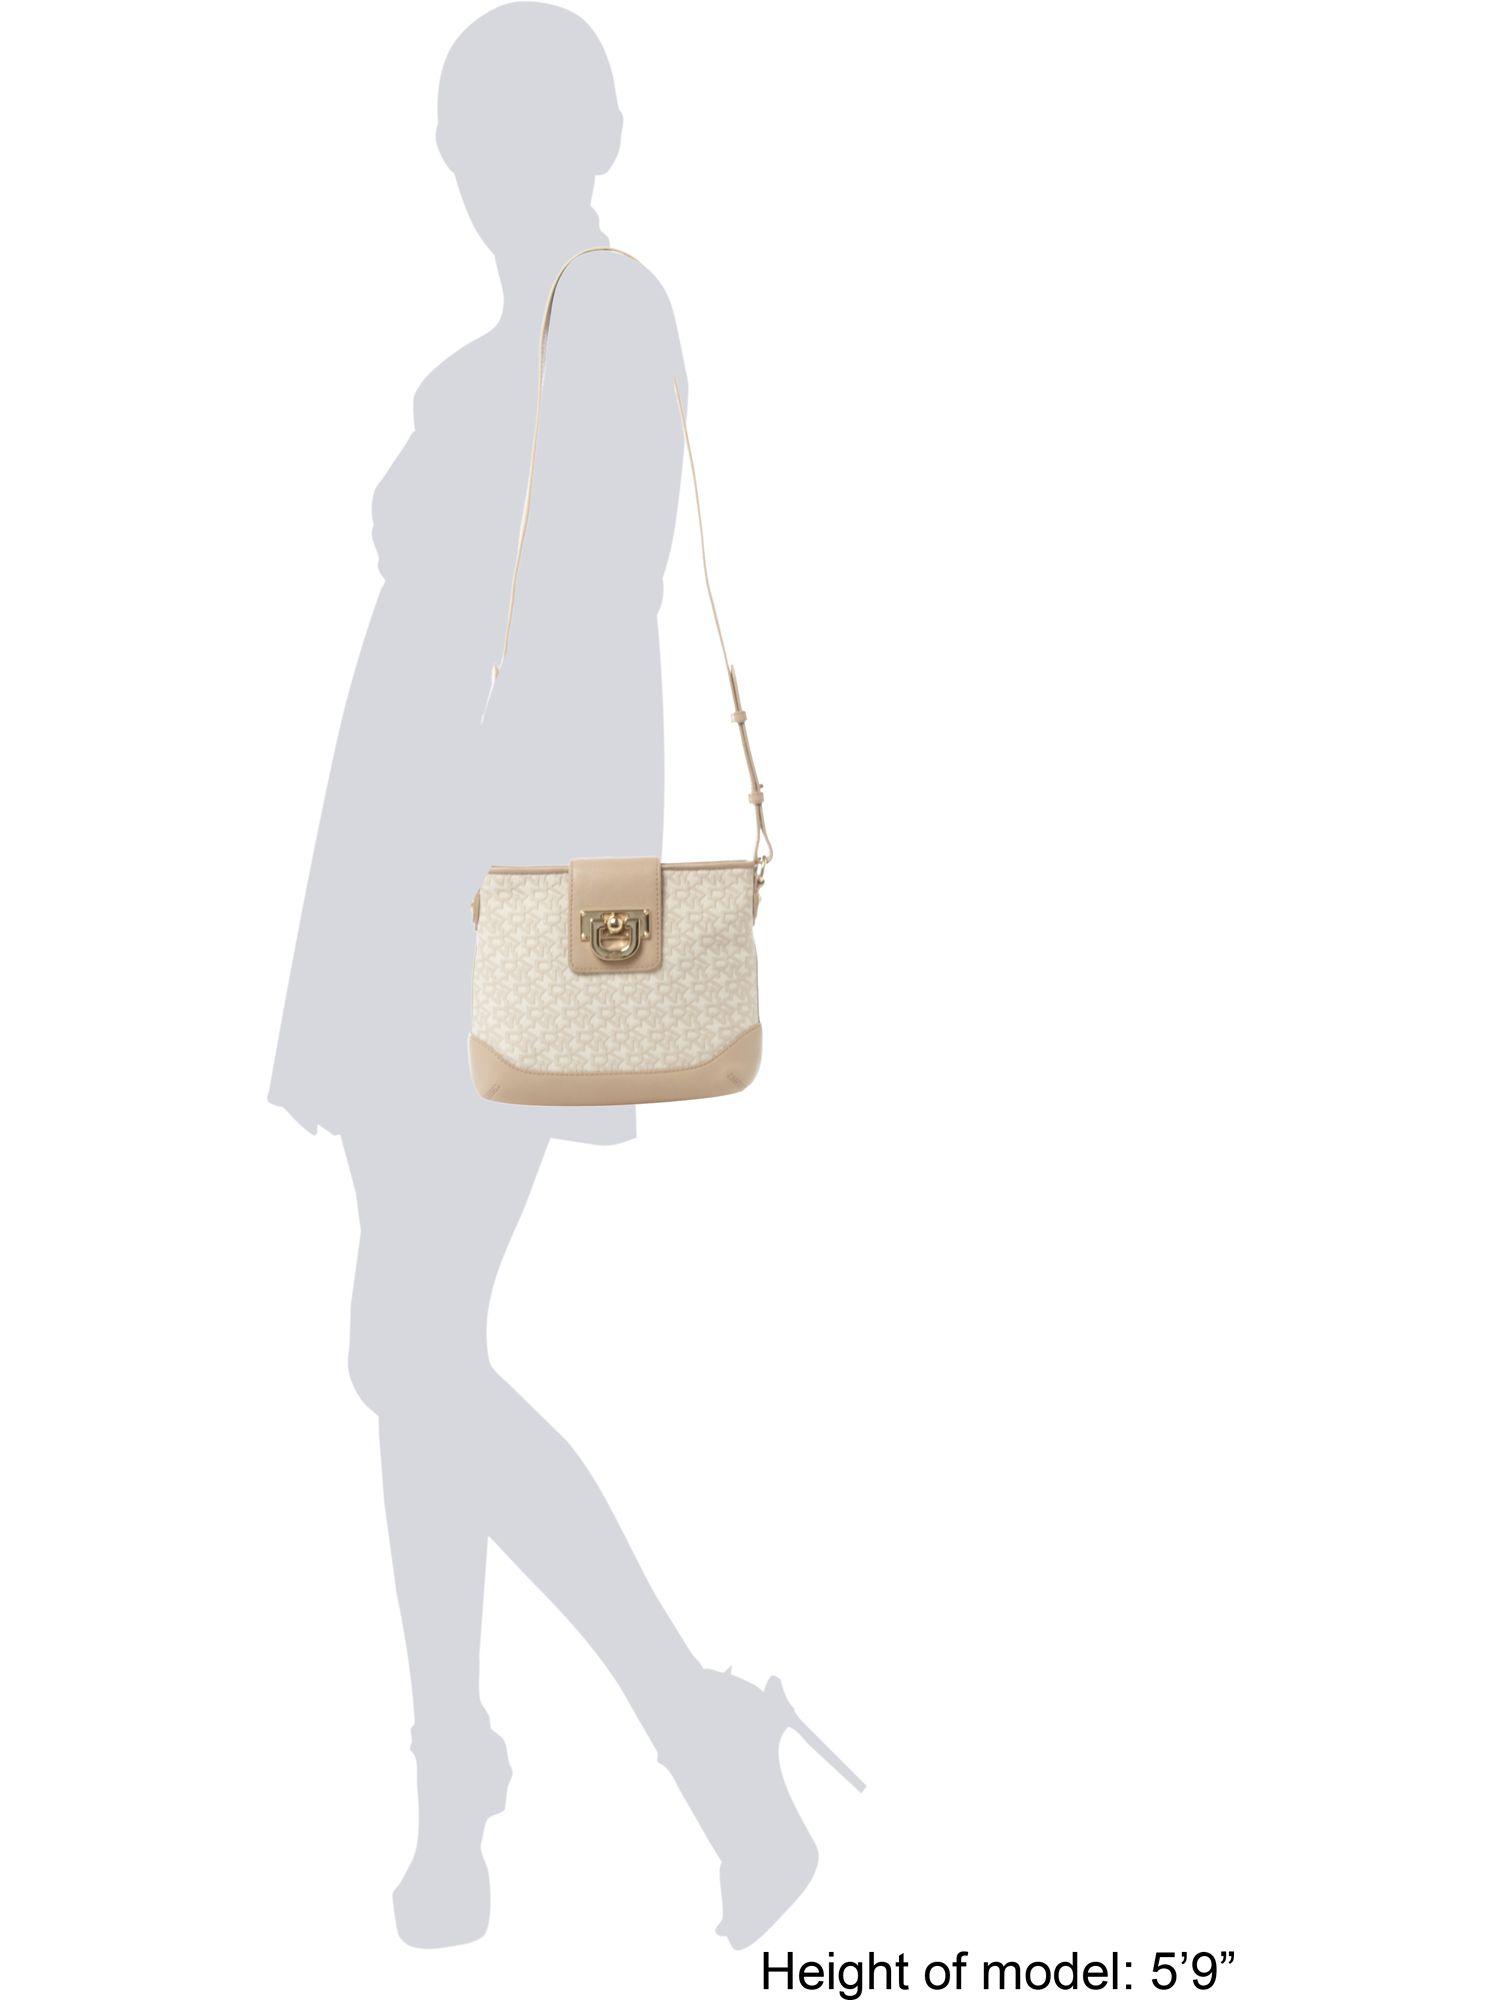 DKNY Tc Vintage Crossbody Bag in Brown (Natural)